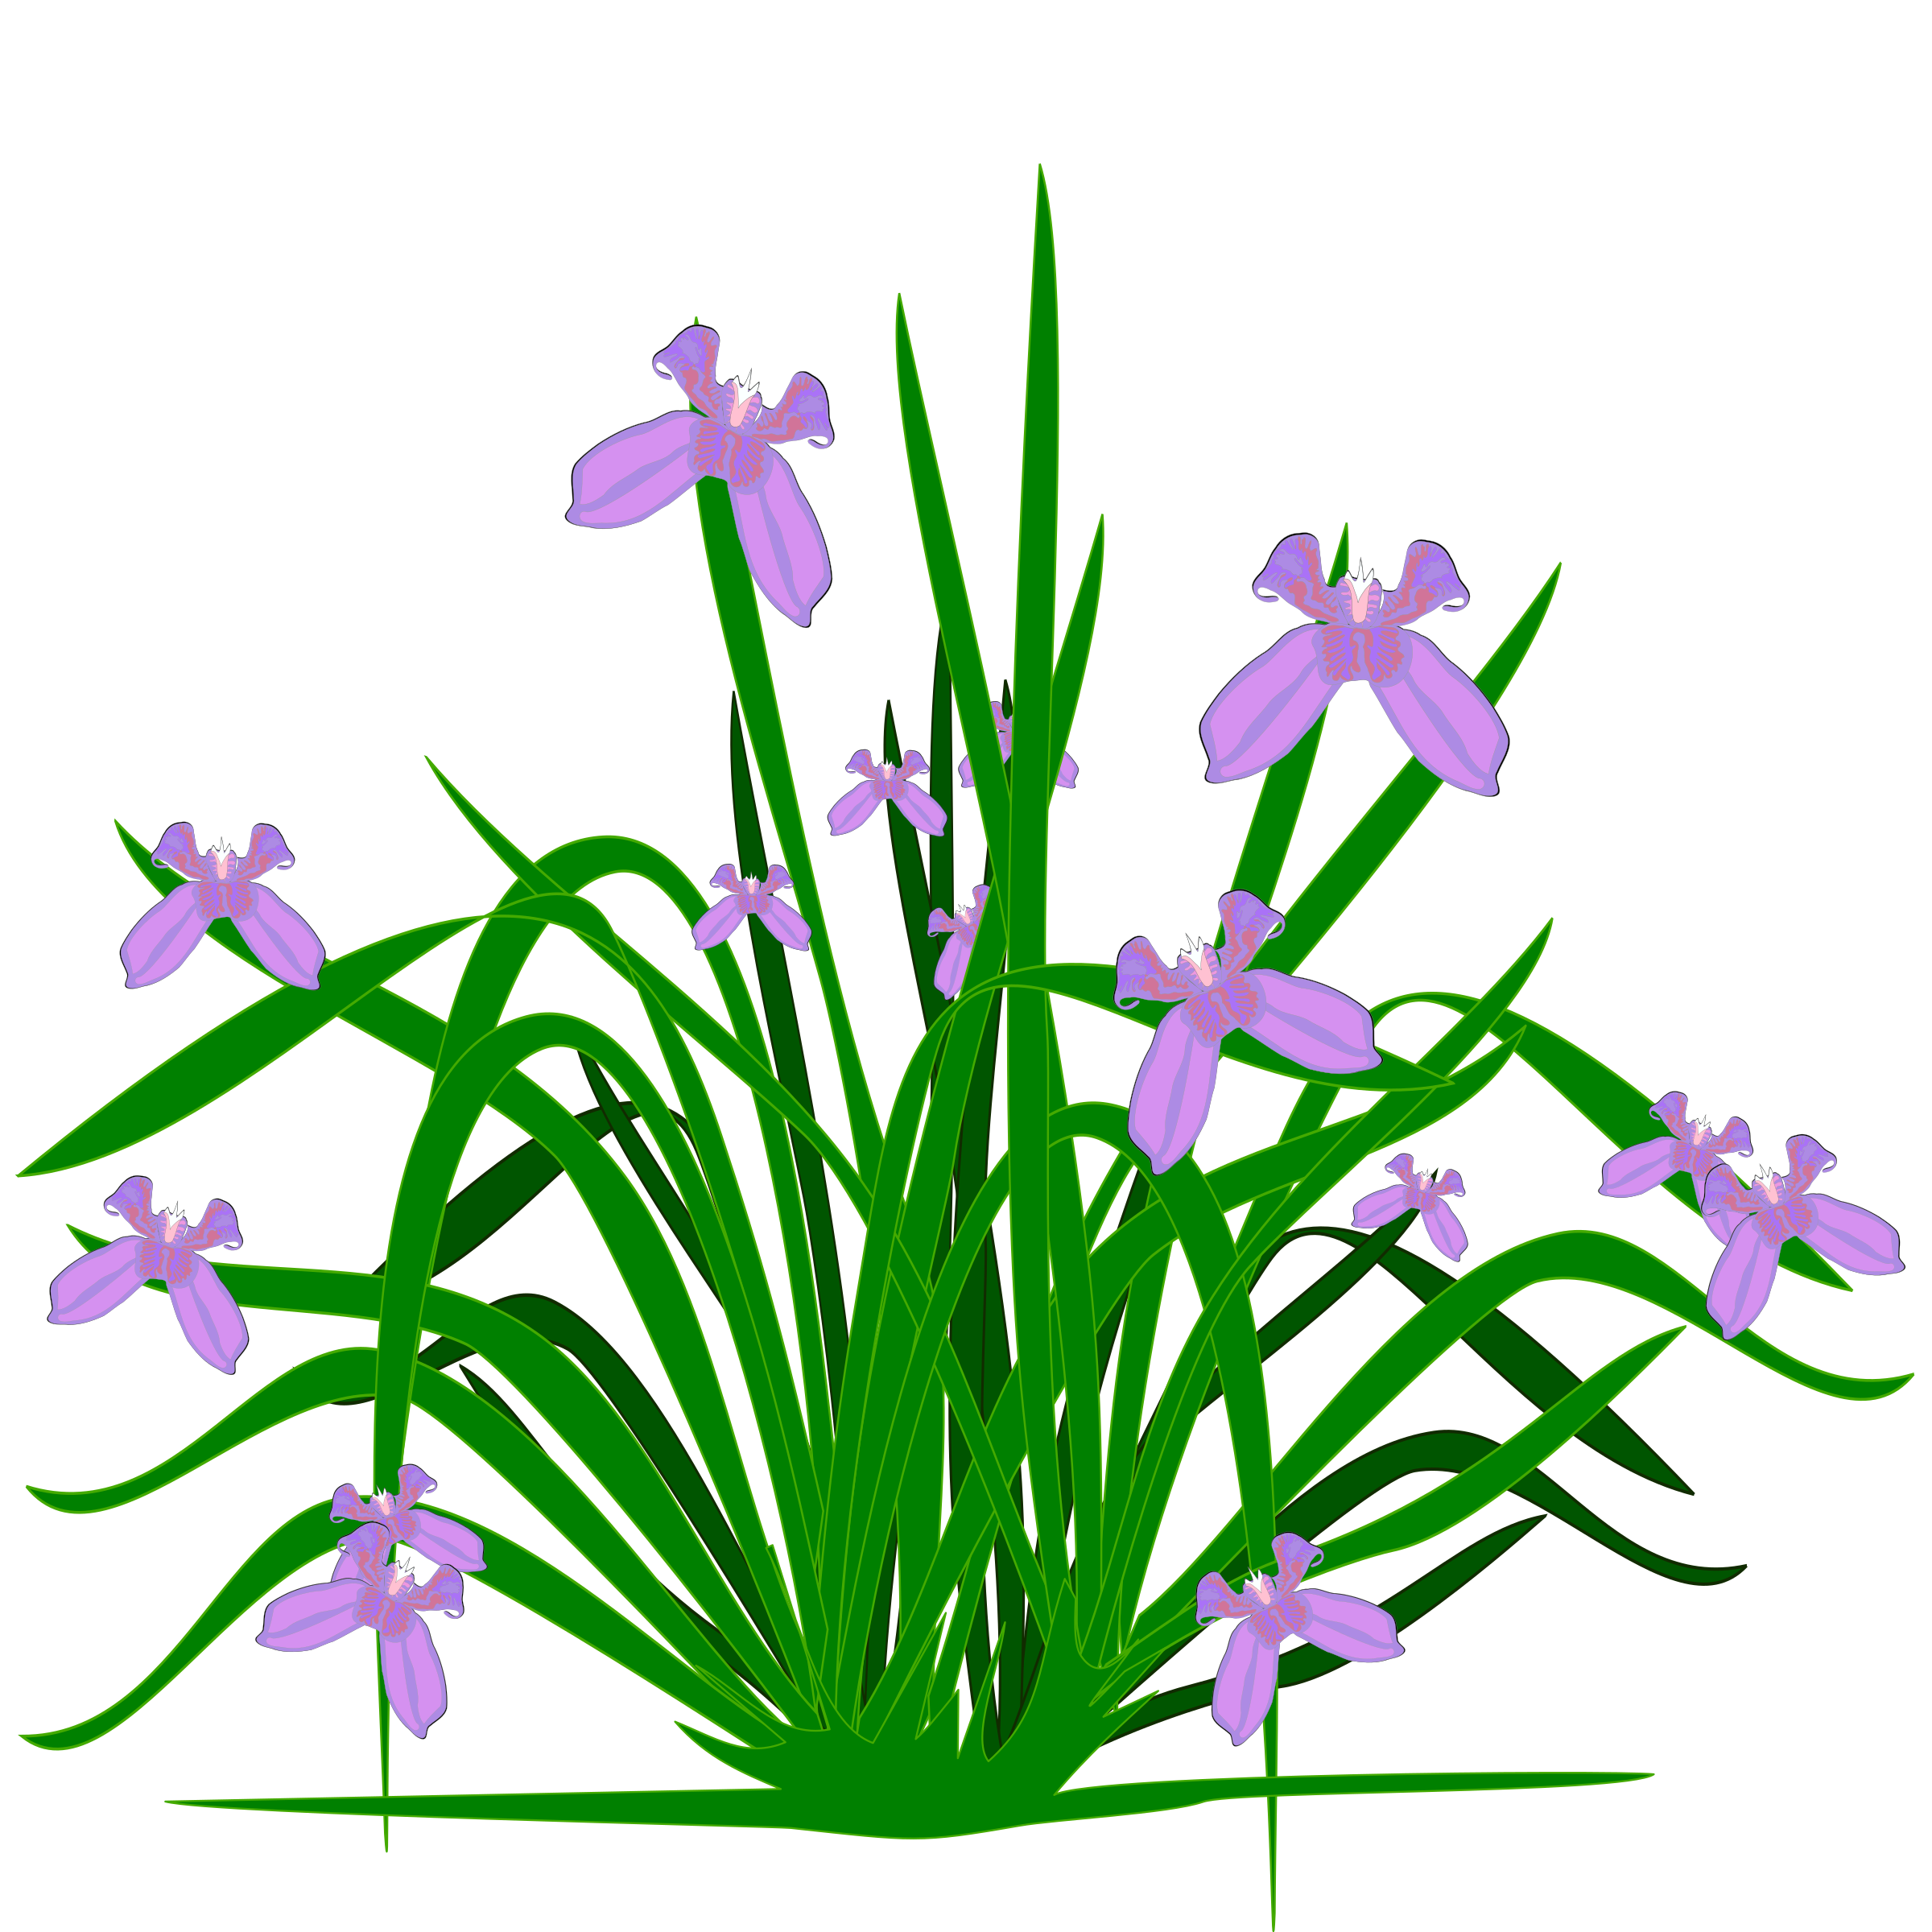 Plant a flower clipart banner freeuse download Flower Irises Iris croatica Clip art - plants 2400*2400 transprent ... banner freeuse download